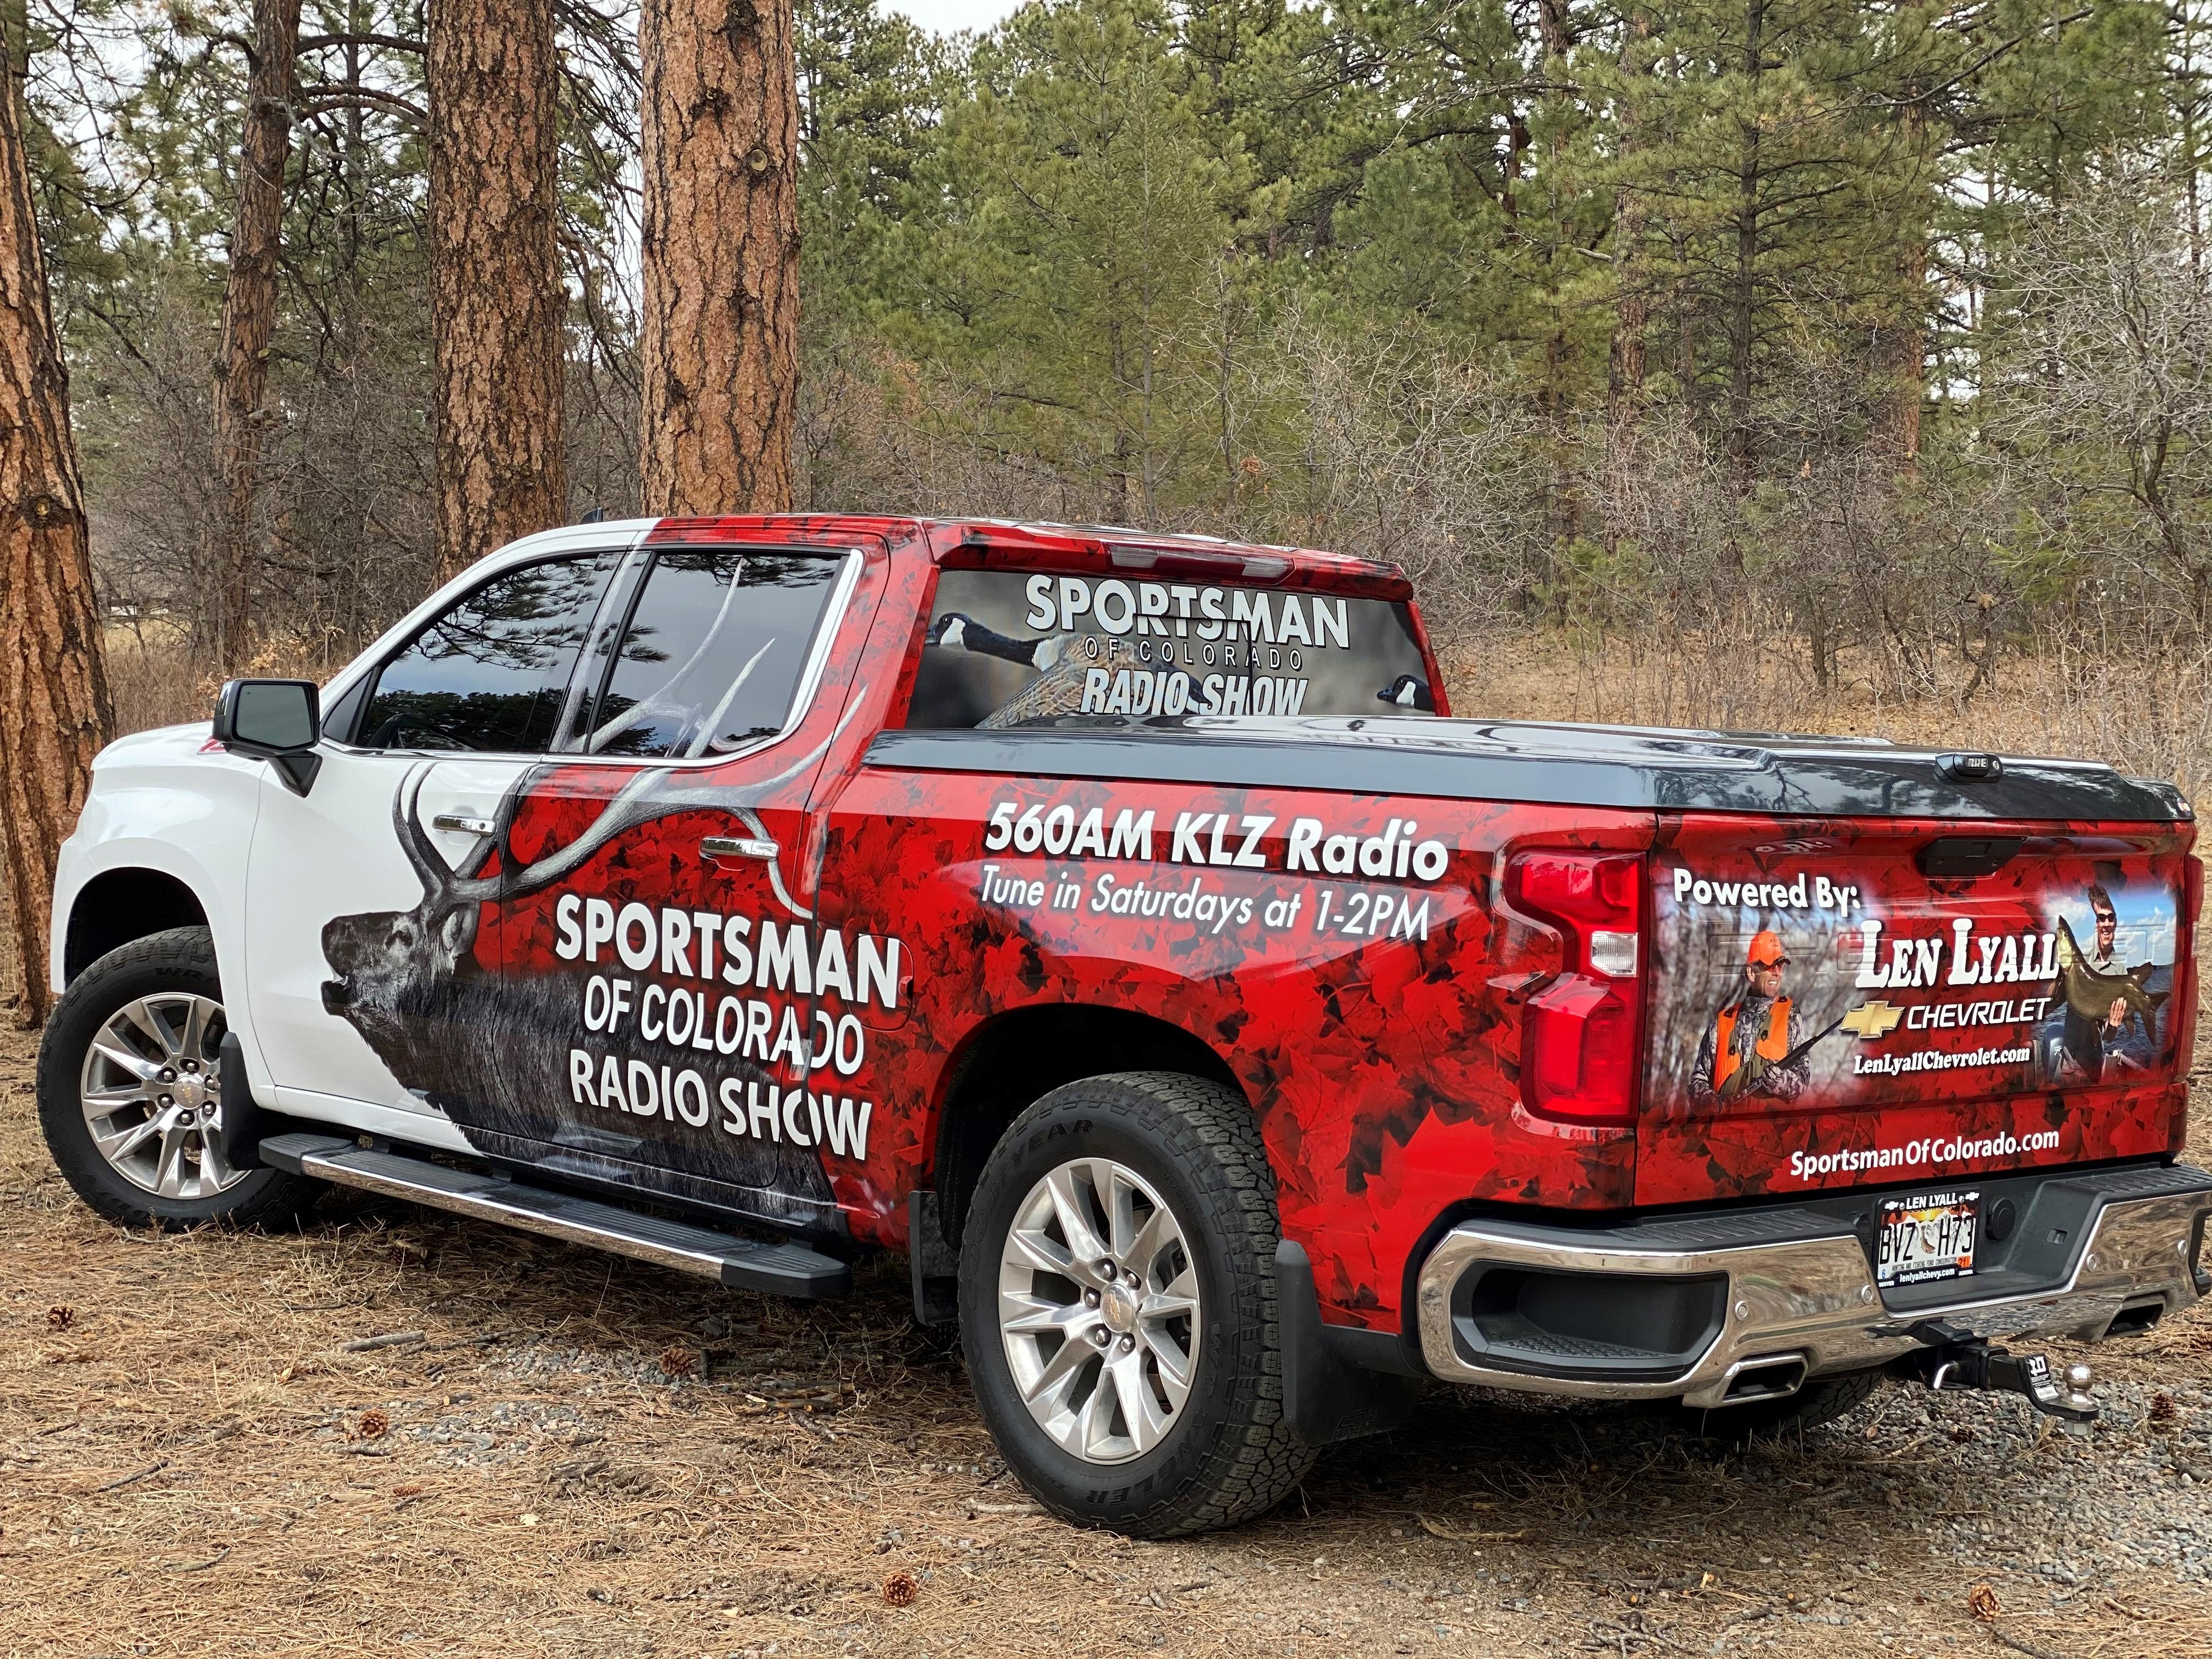 March 27, 2021: Len Lyall Chevrolet – Phoenix Weaponry – Colorado Bowhunters Association – Tactacam